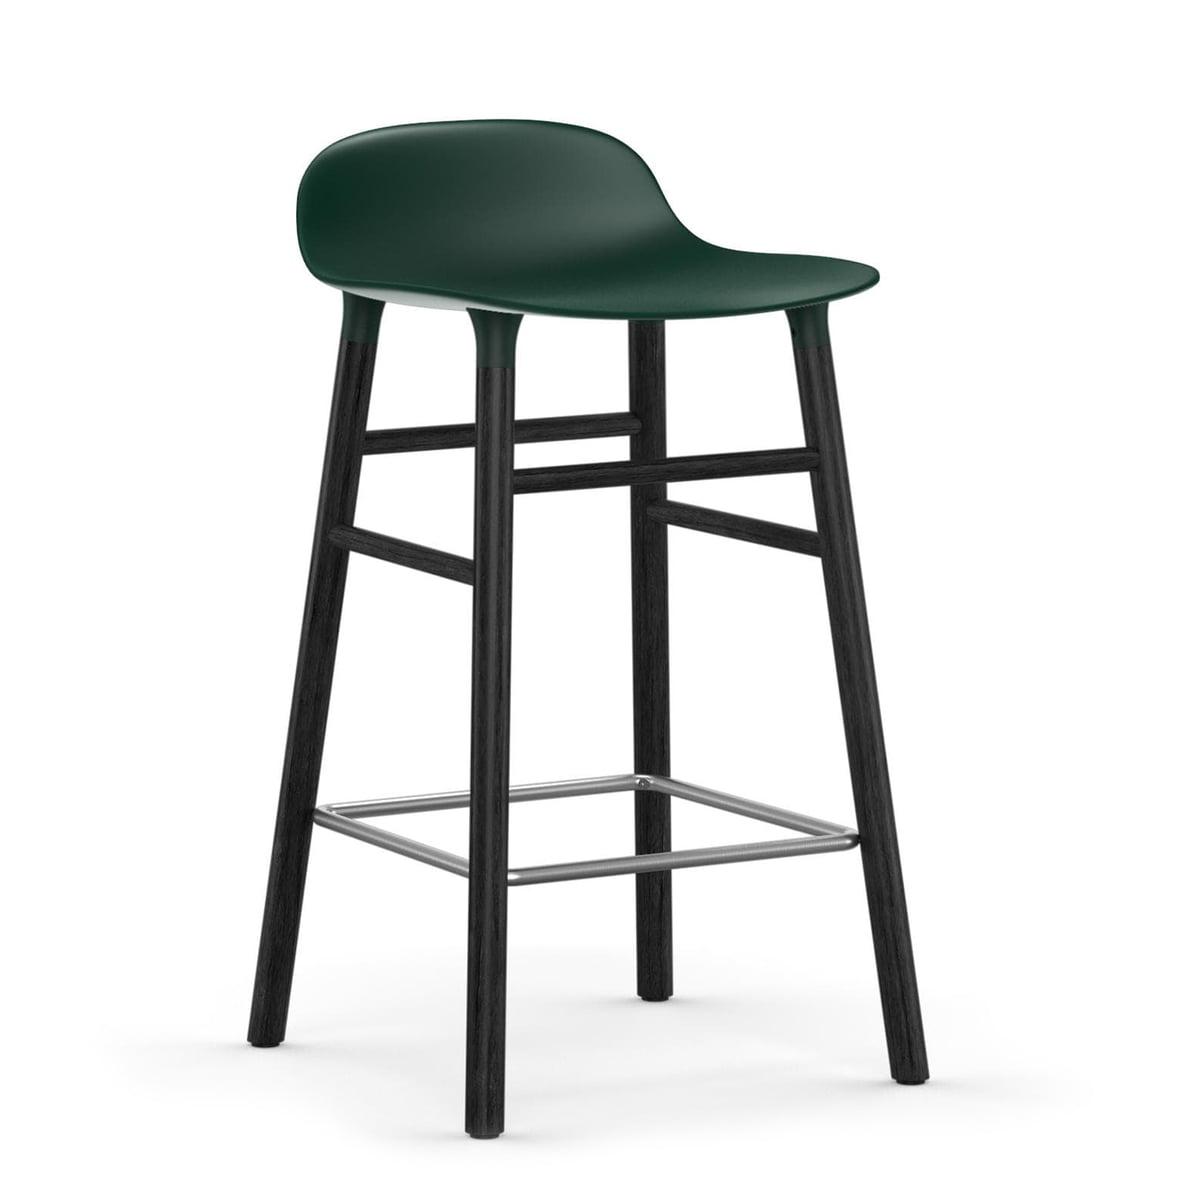 Normann Copenhagen - Form tabouret de bar 65 cm, piètement en chêne noir / vert